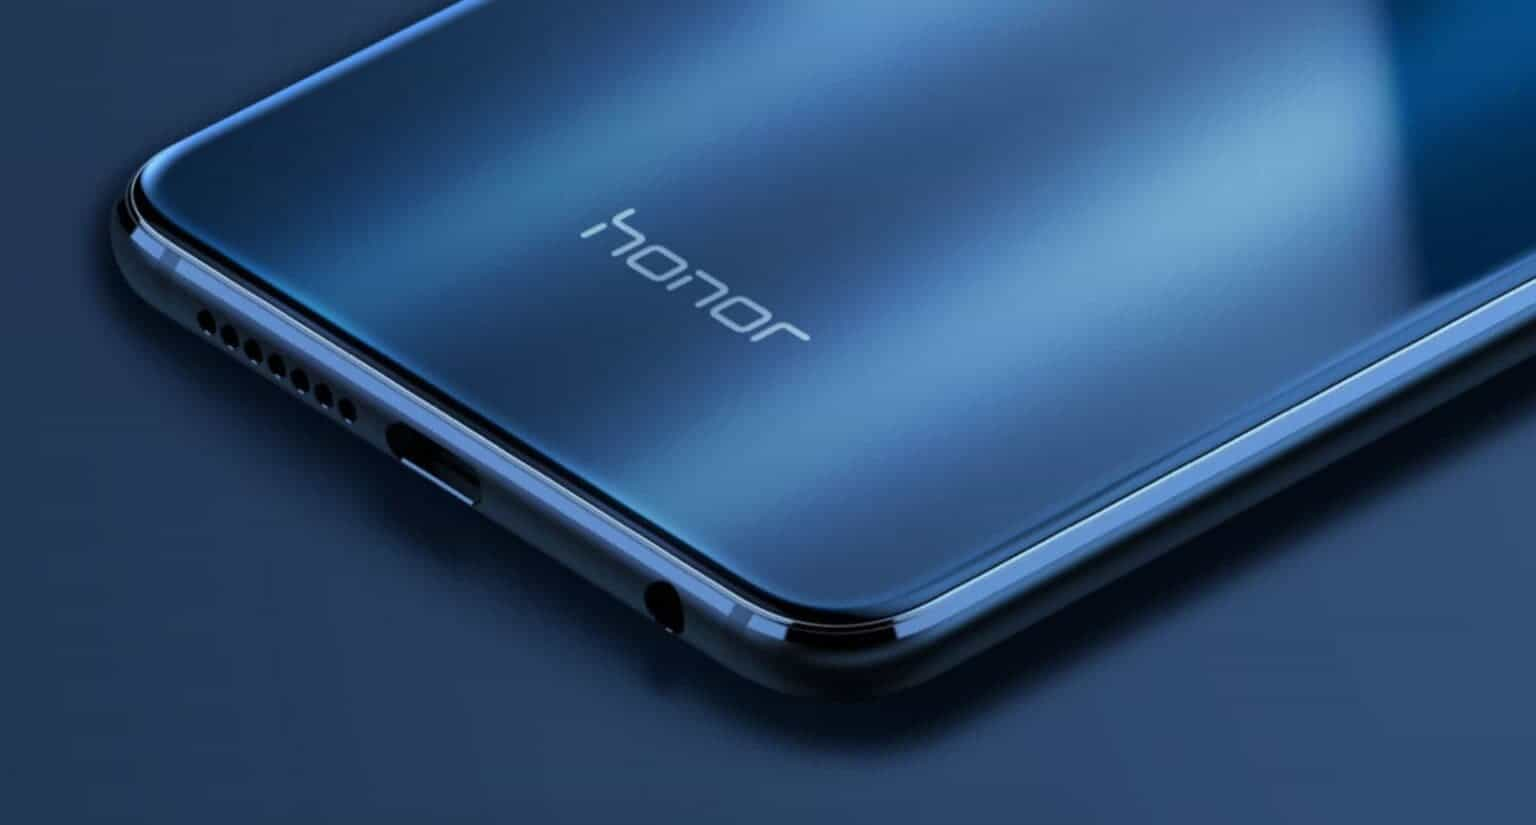 Складной смартфон Honor Magic X получит 8-дюймовый гибкий дисплей (honor 1536x825 1)